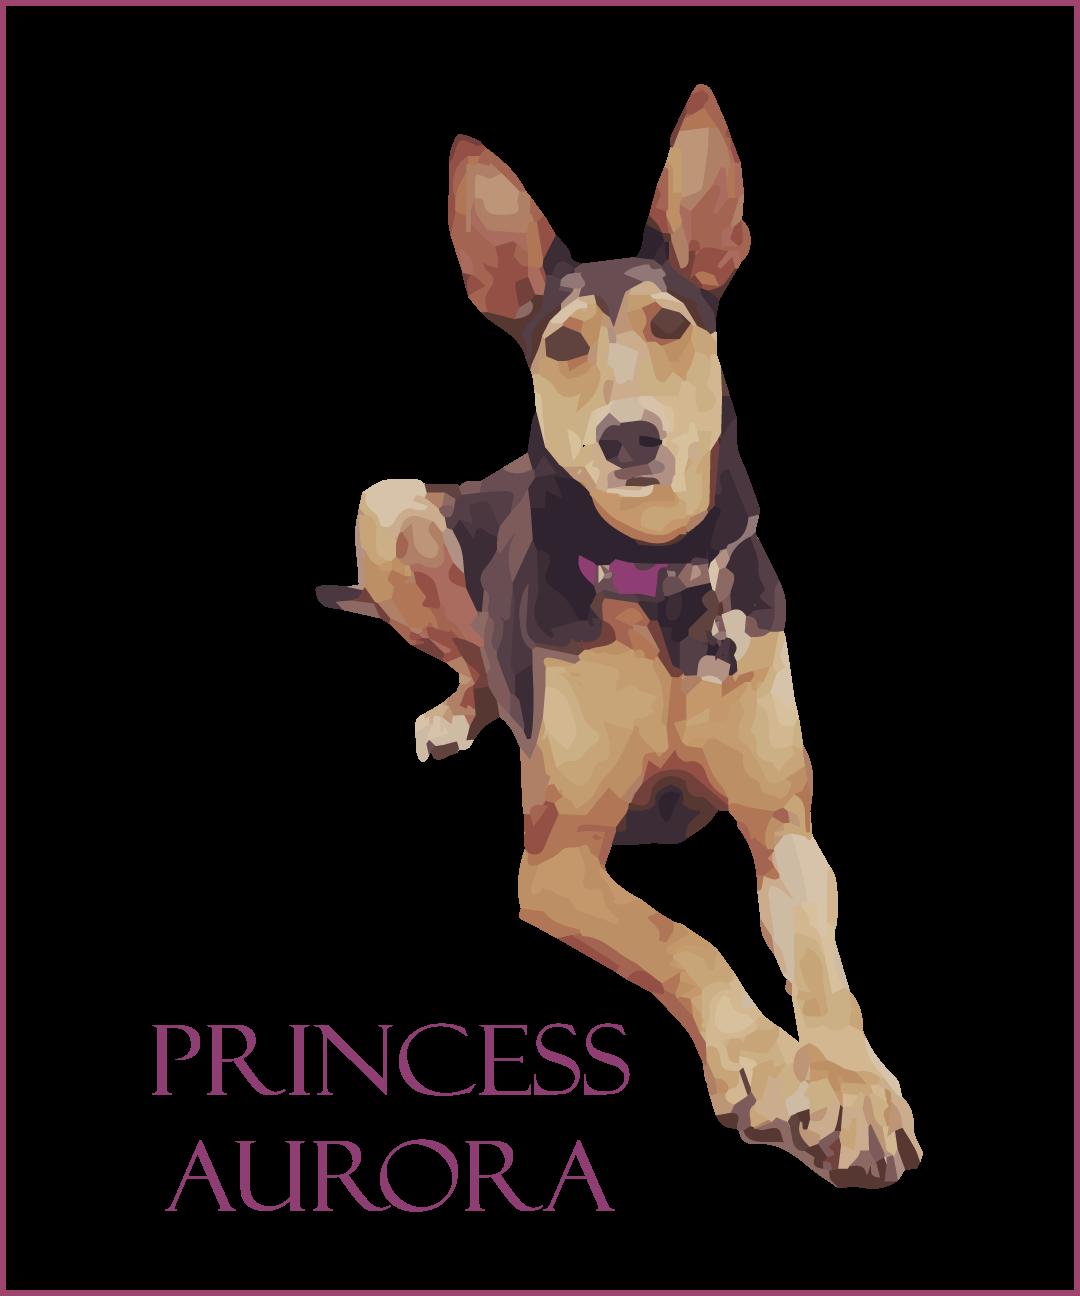 Princess-Aurora.png